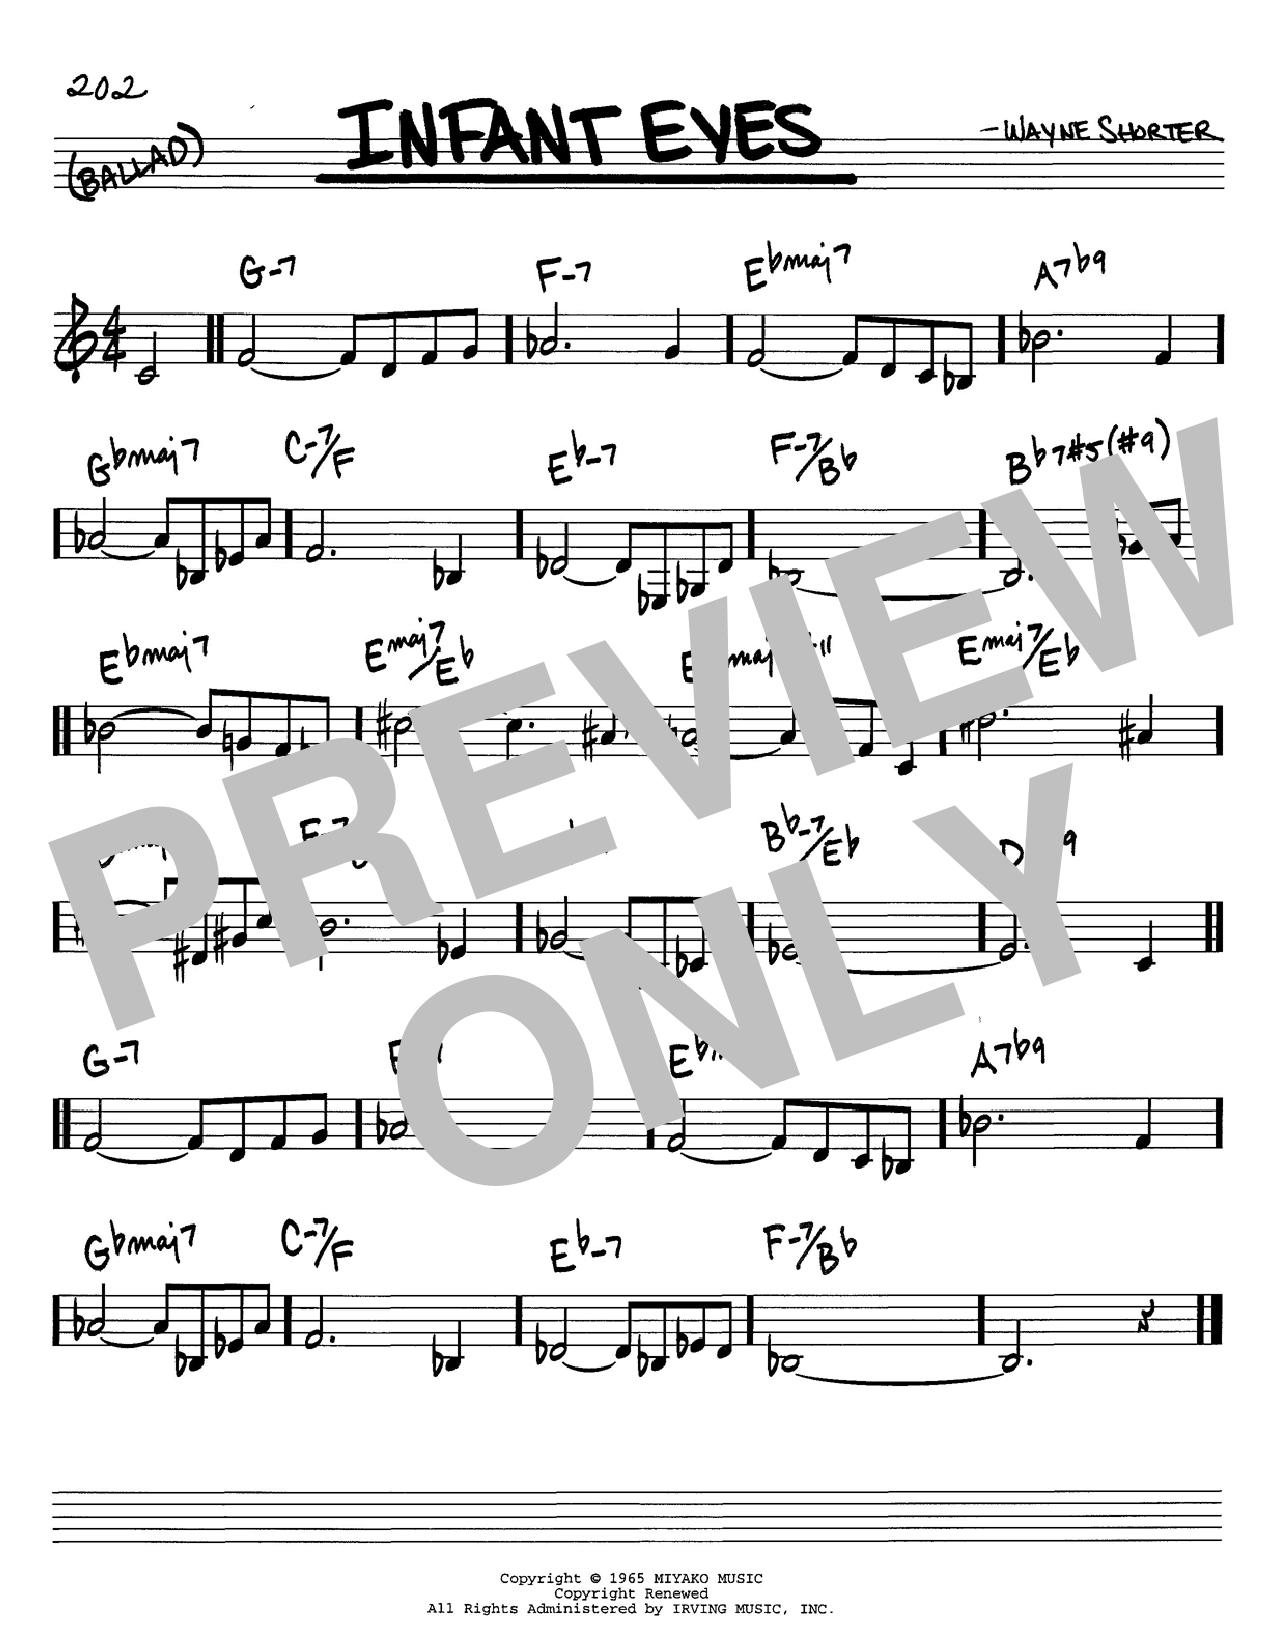 Wayne Shorter 'Infant Eyes' Sheet Music Notes, Chords | Download Printable  Real Book - Melody & Chords - C Instruments - SKU: 60184